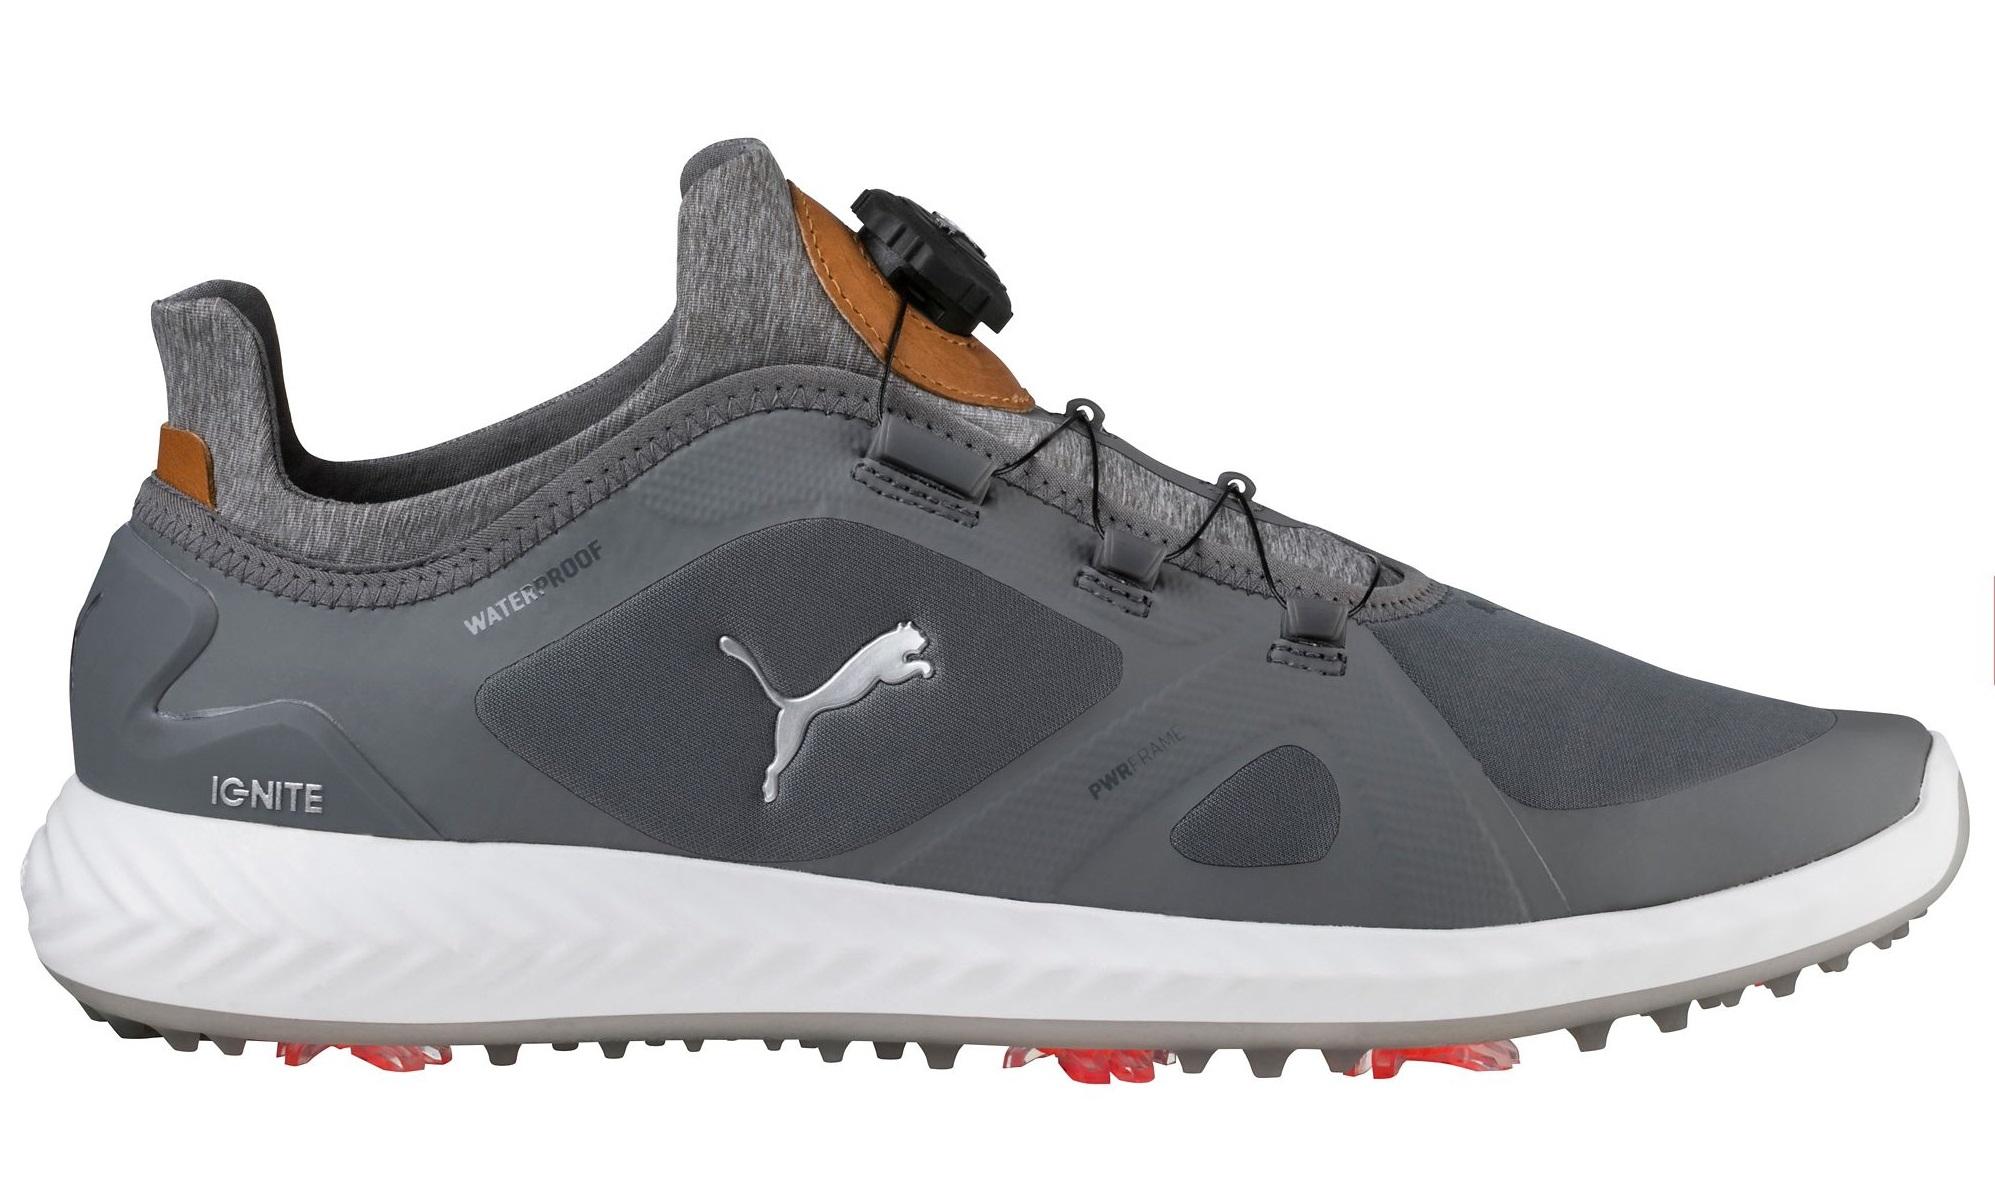 db1109361c4 Puma Golf- Ignite PWRAdapt Disc Shoes